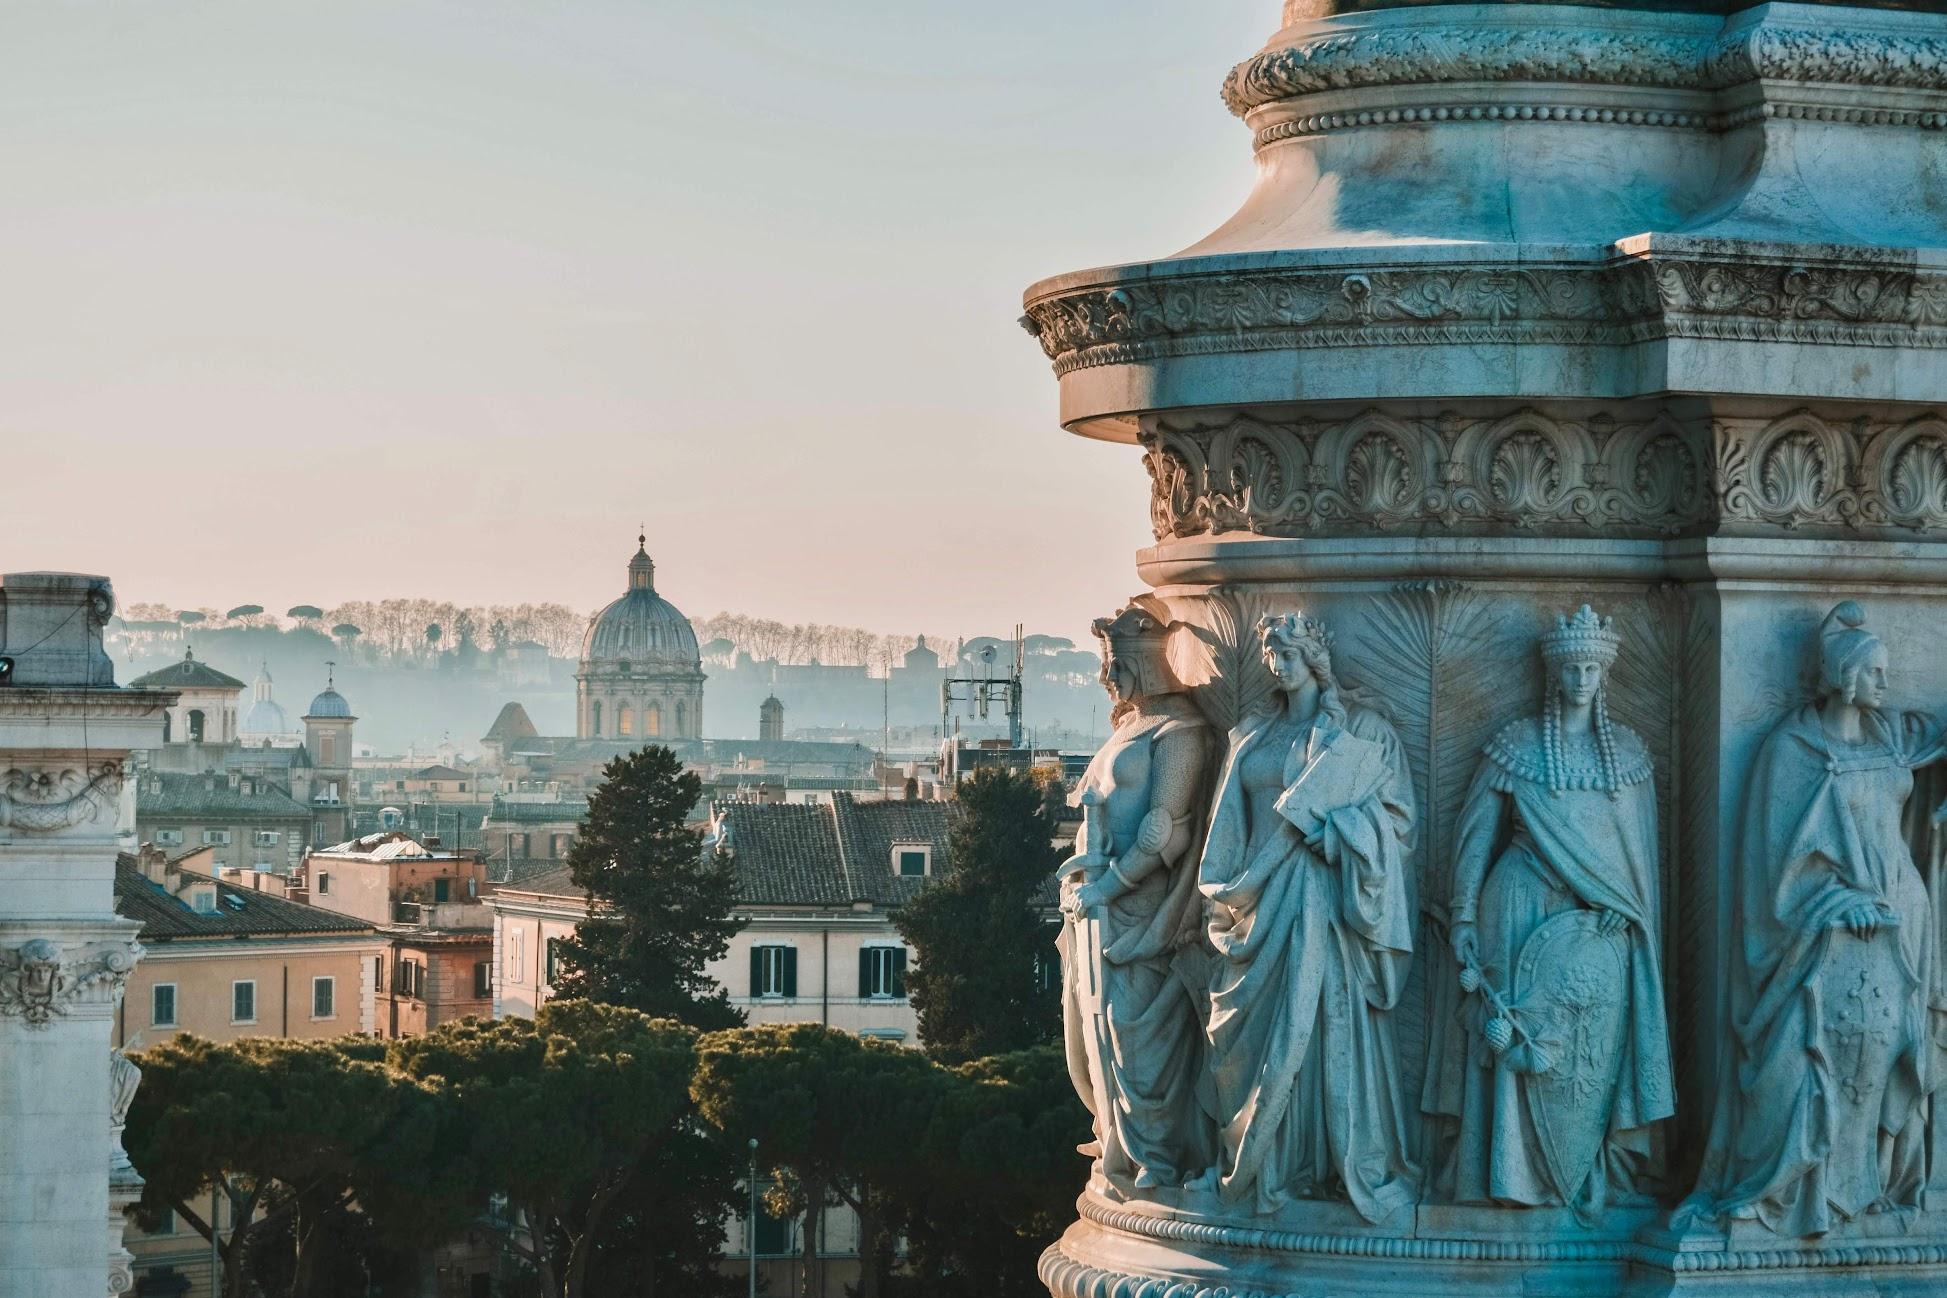 stedentrip-rome-tips